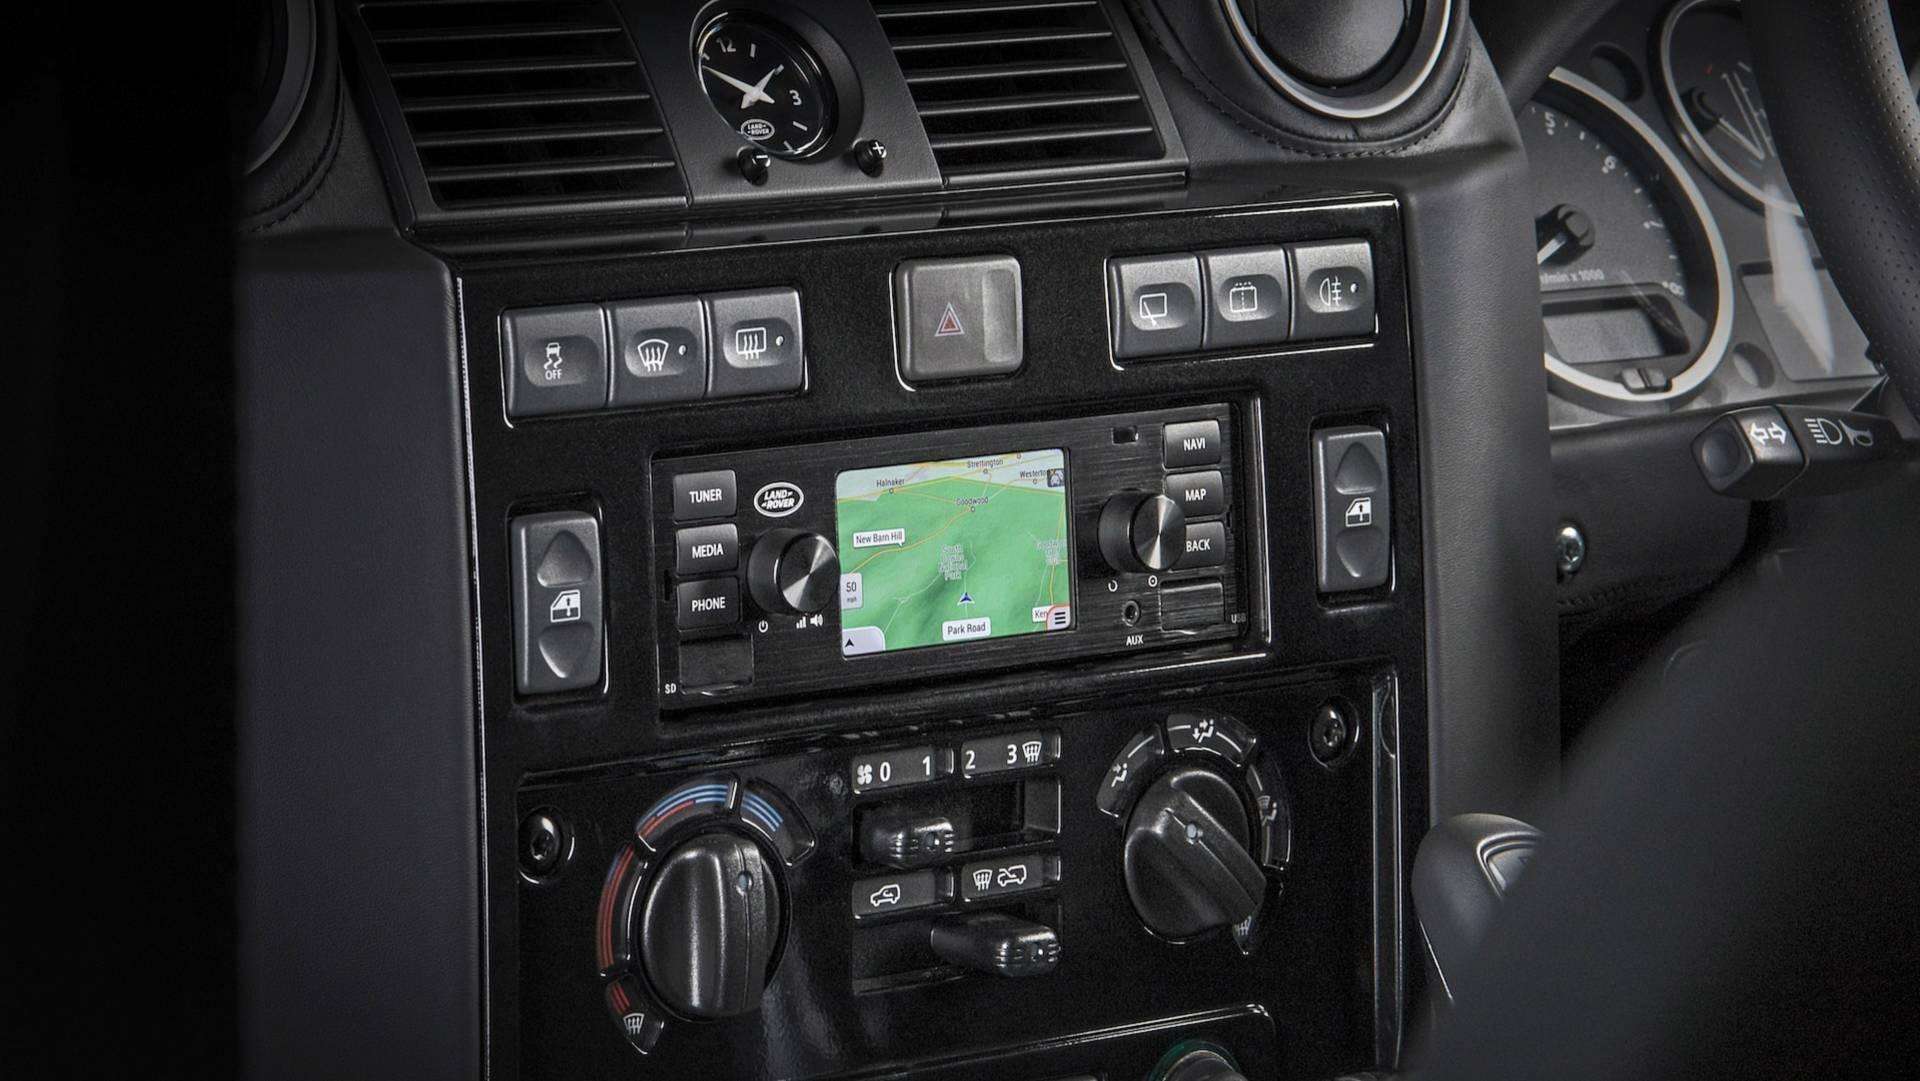 jaguar-land-rover-classic-infotainment-system (3)